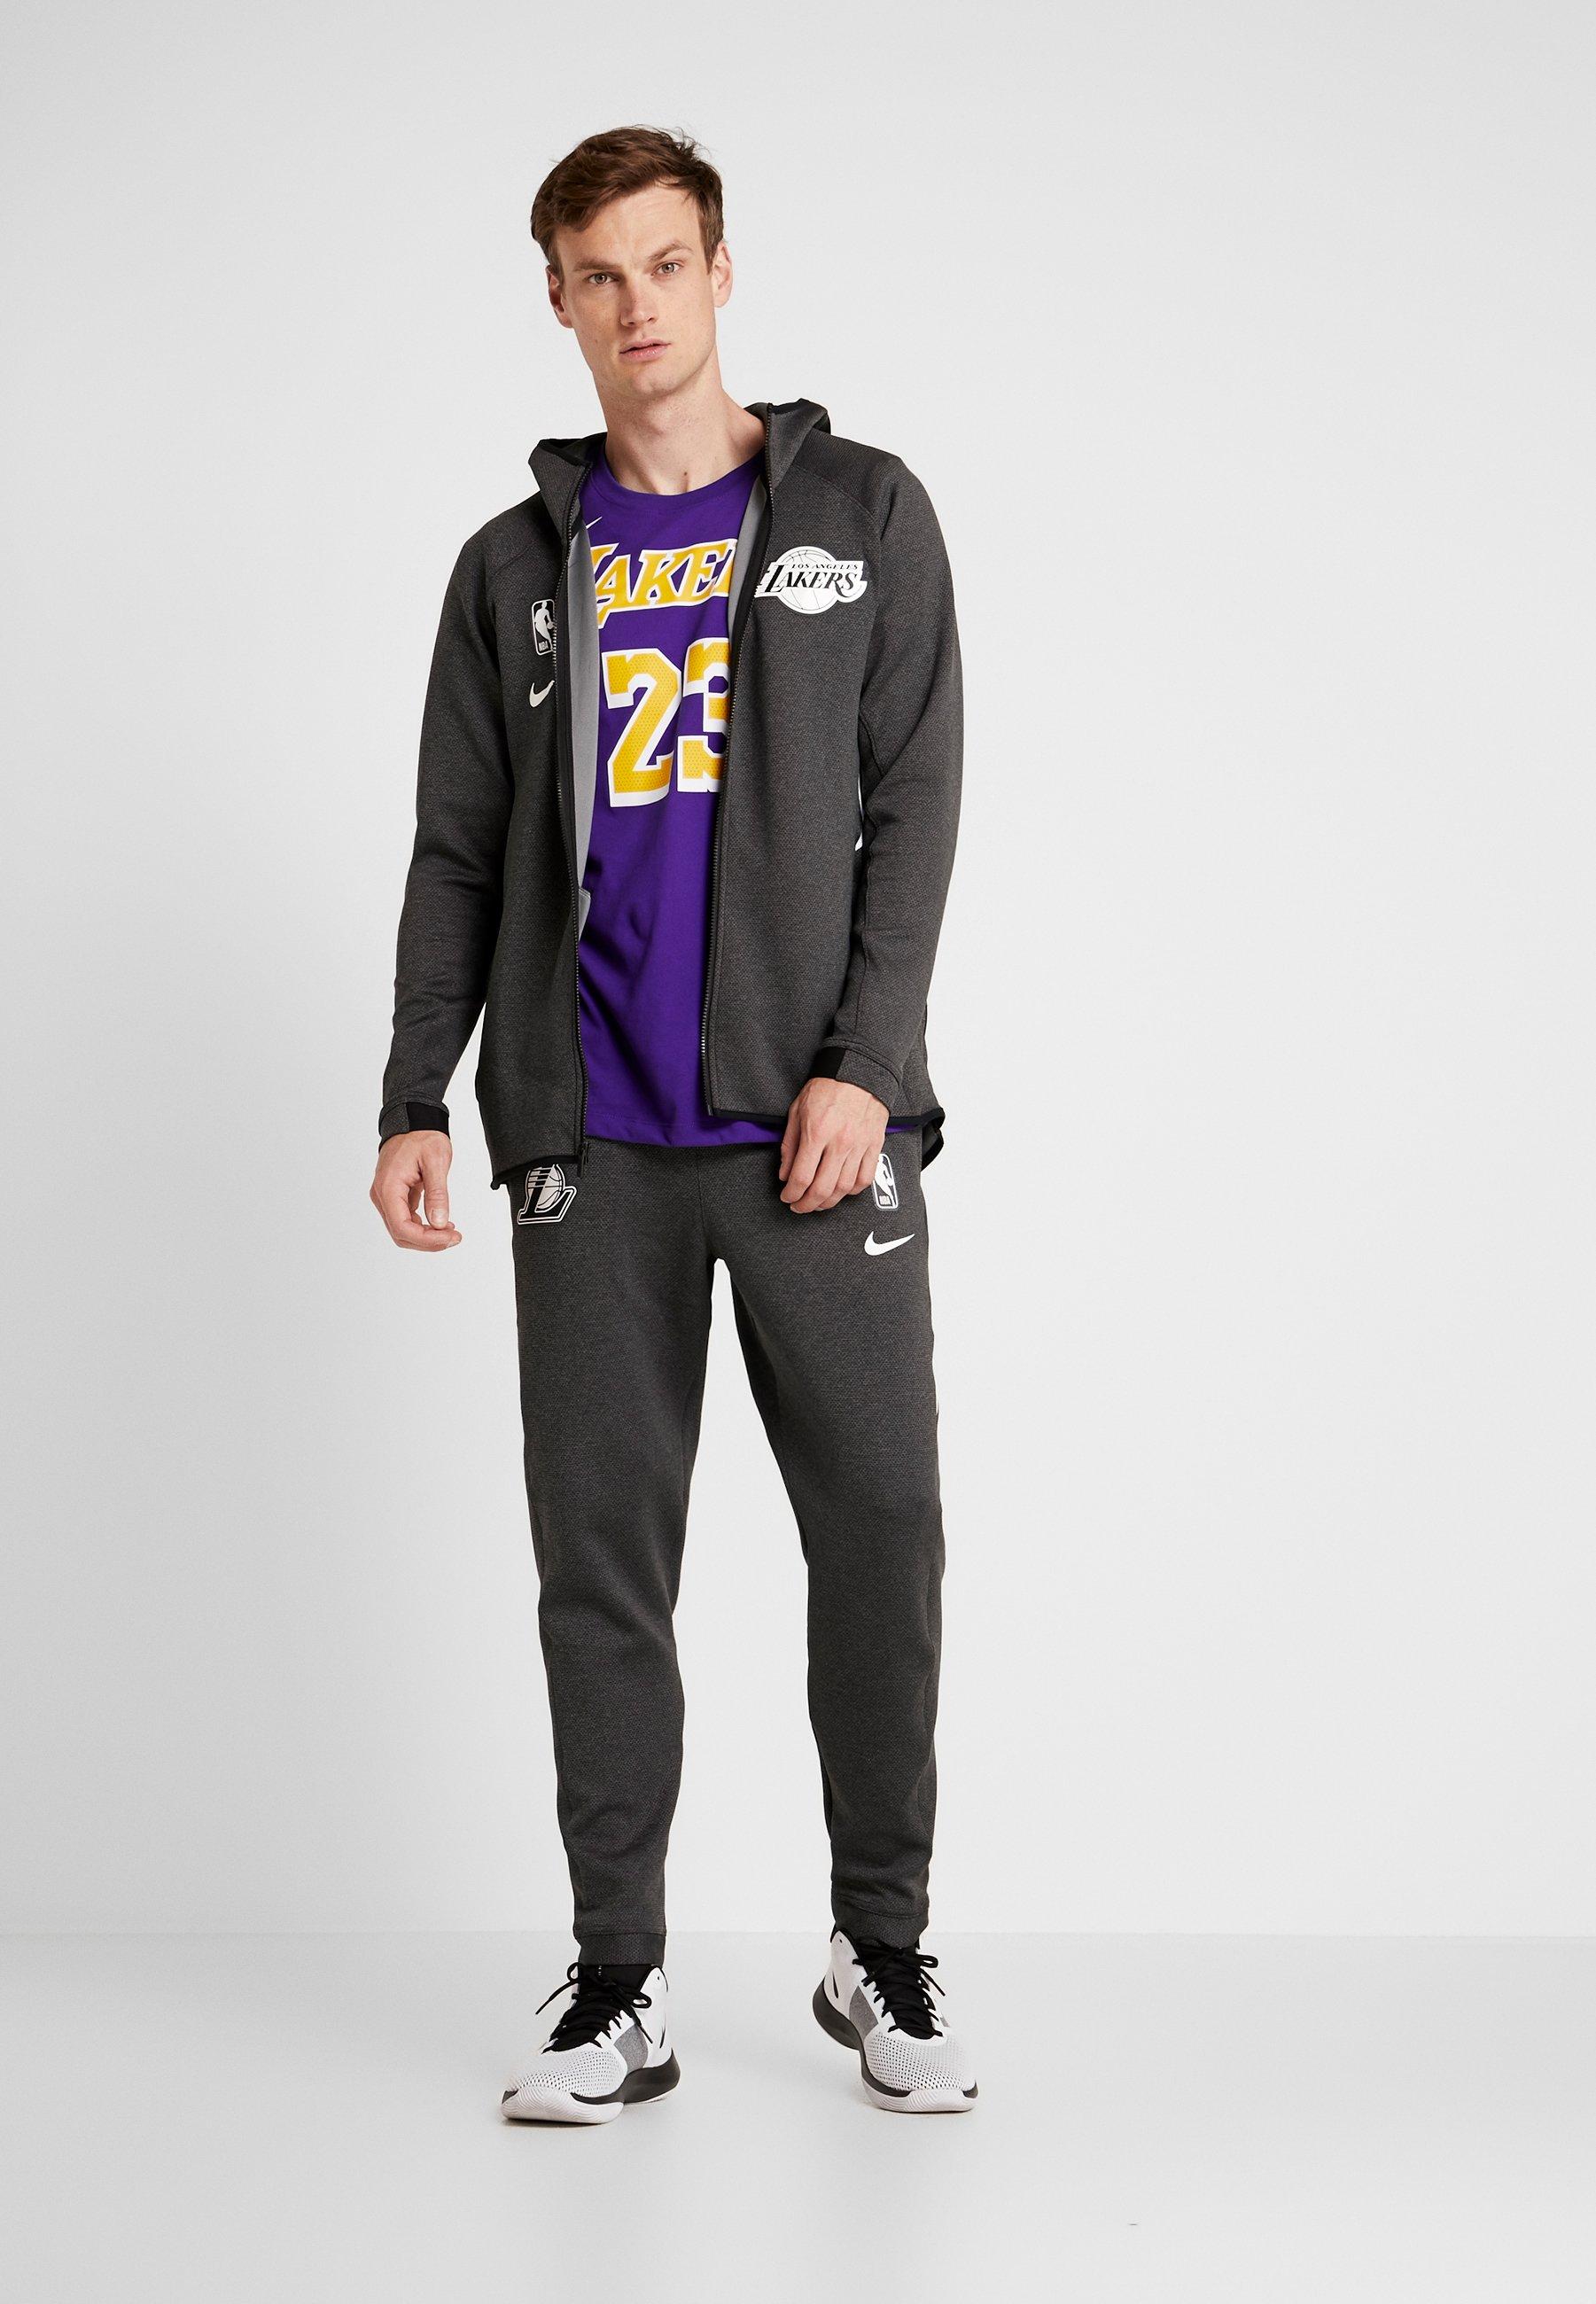 Nike Performance Nba Los Angeles Lakers Thermaflex - Veste De Survêtement Black Heather/cool Grey/white